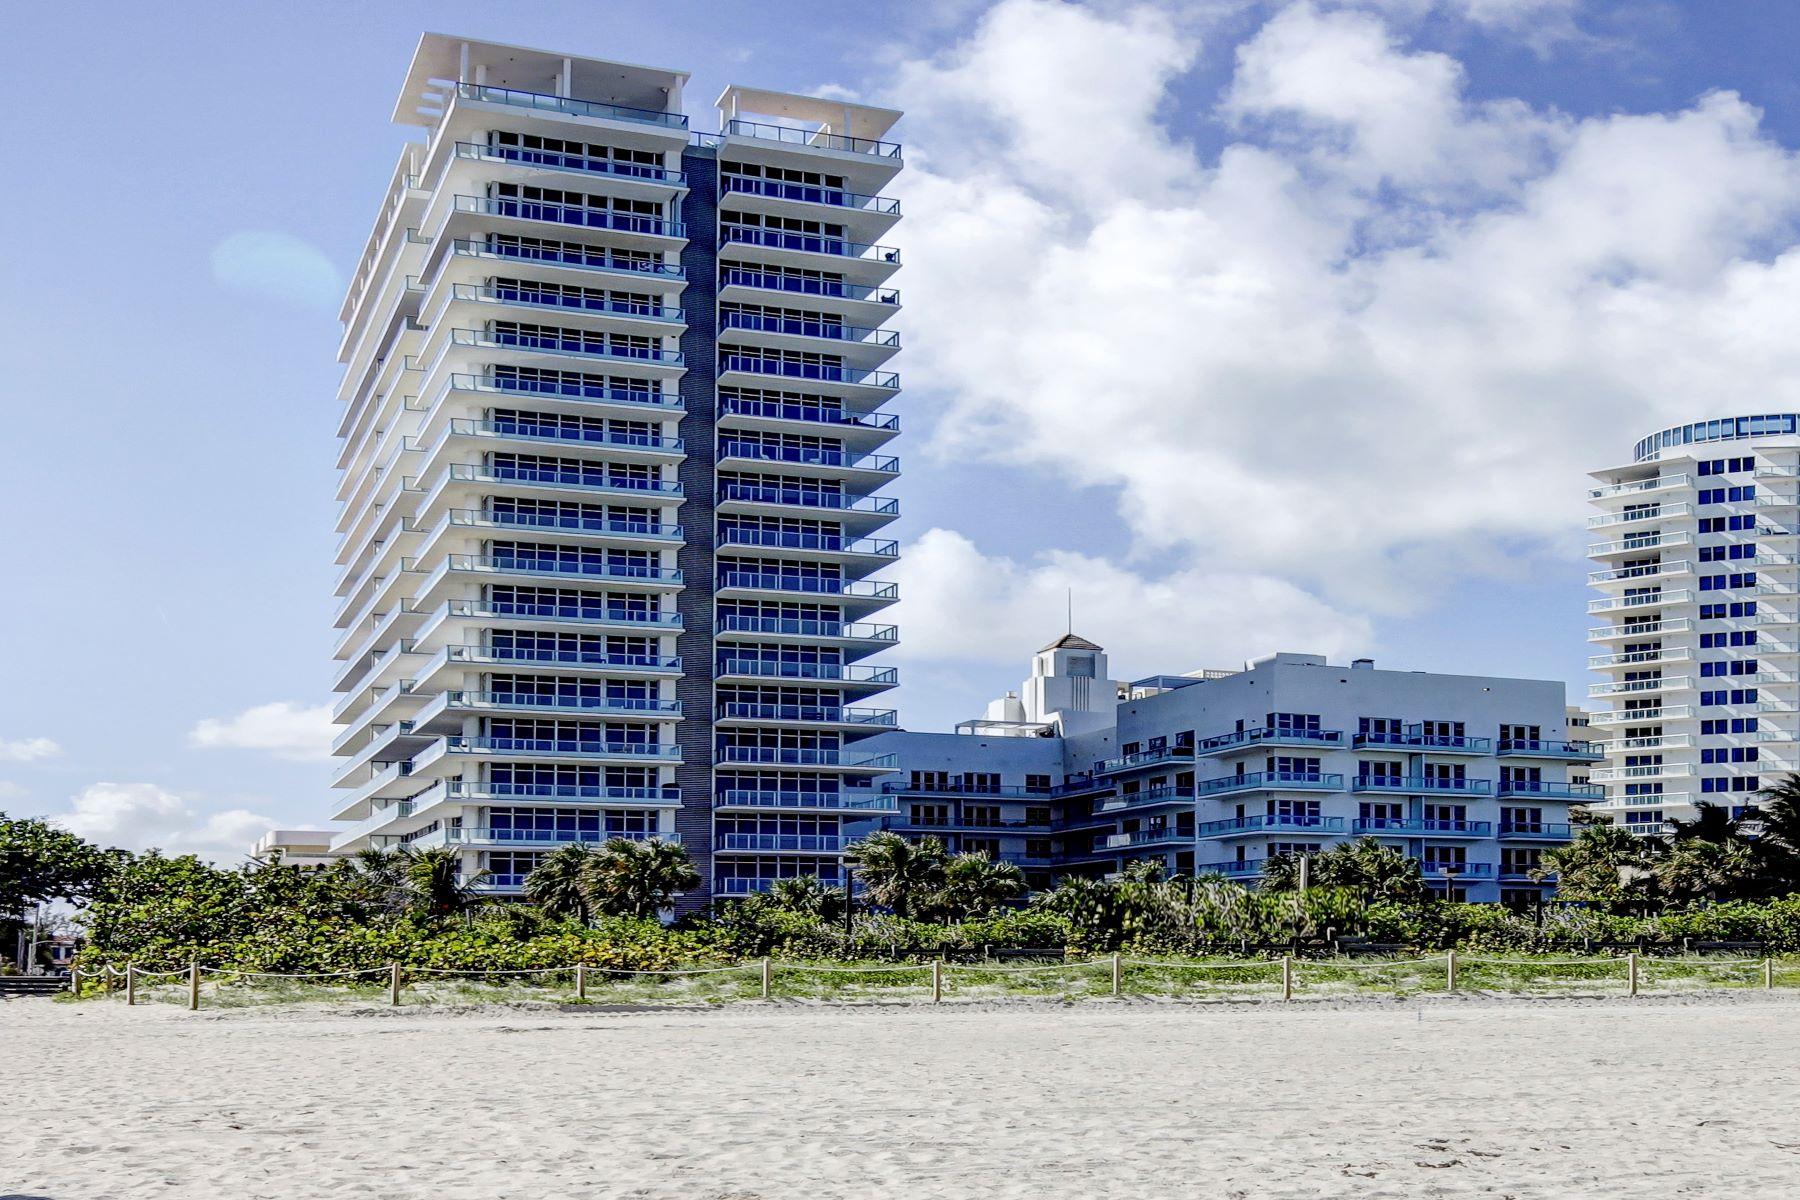 شقة بعمارة للـ Sale في 3737 Collins Ave #S-603 3737 Collins Ave S-603, Miami Beach, Florida, 33140 United States